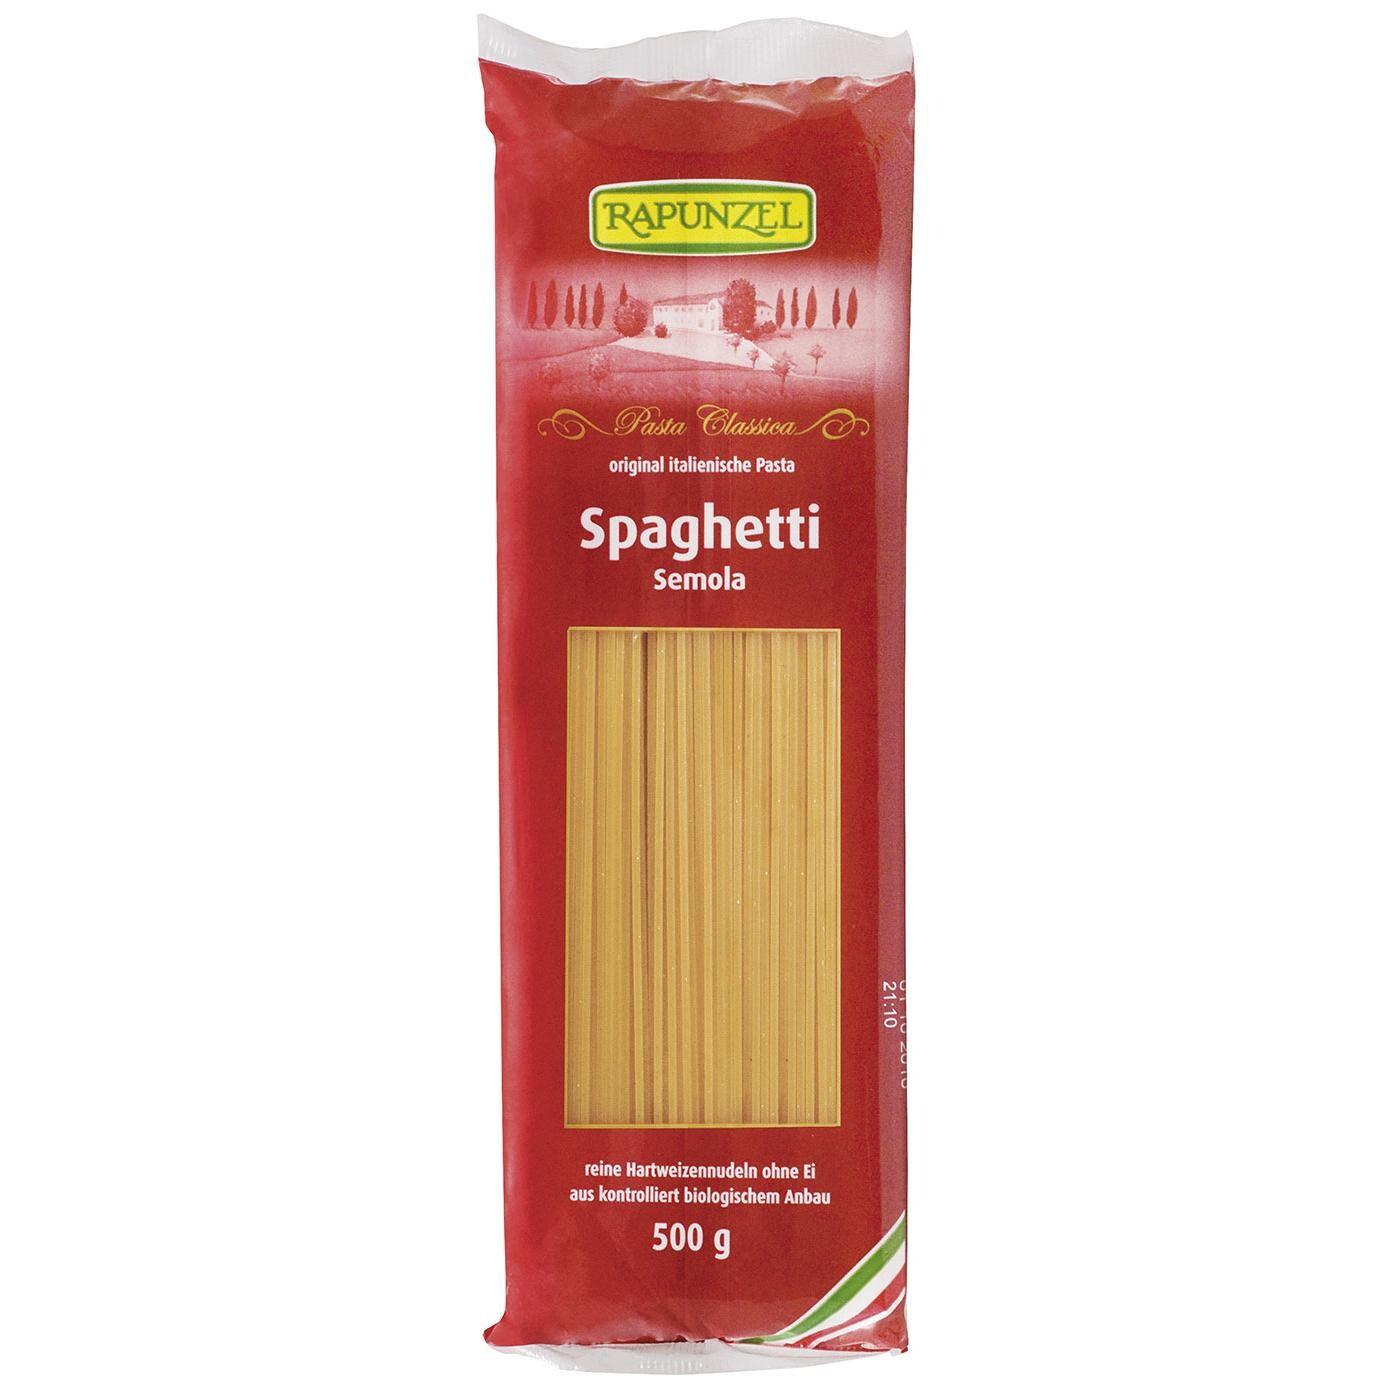 Rapunzel Bio Spaghetti Semola 500g